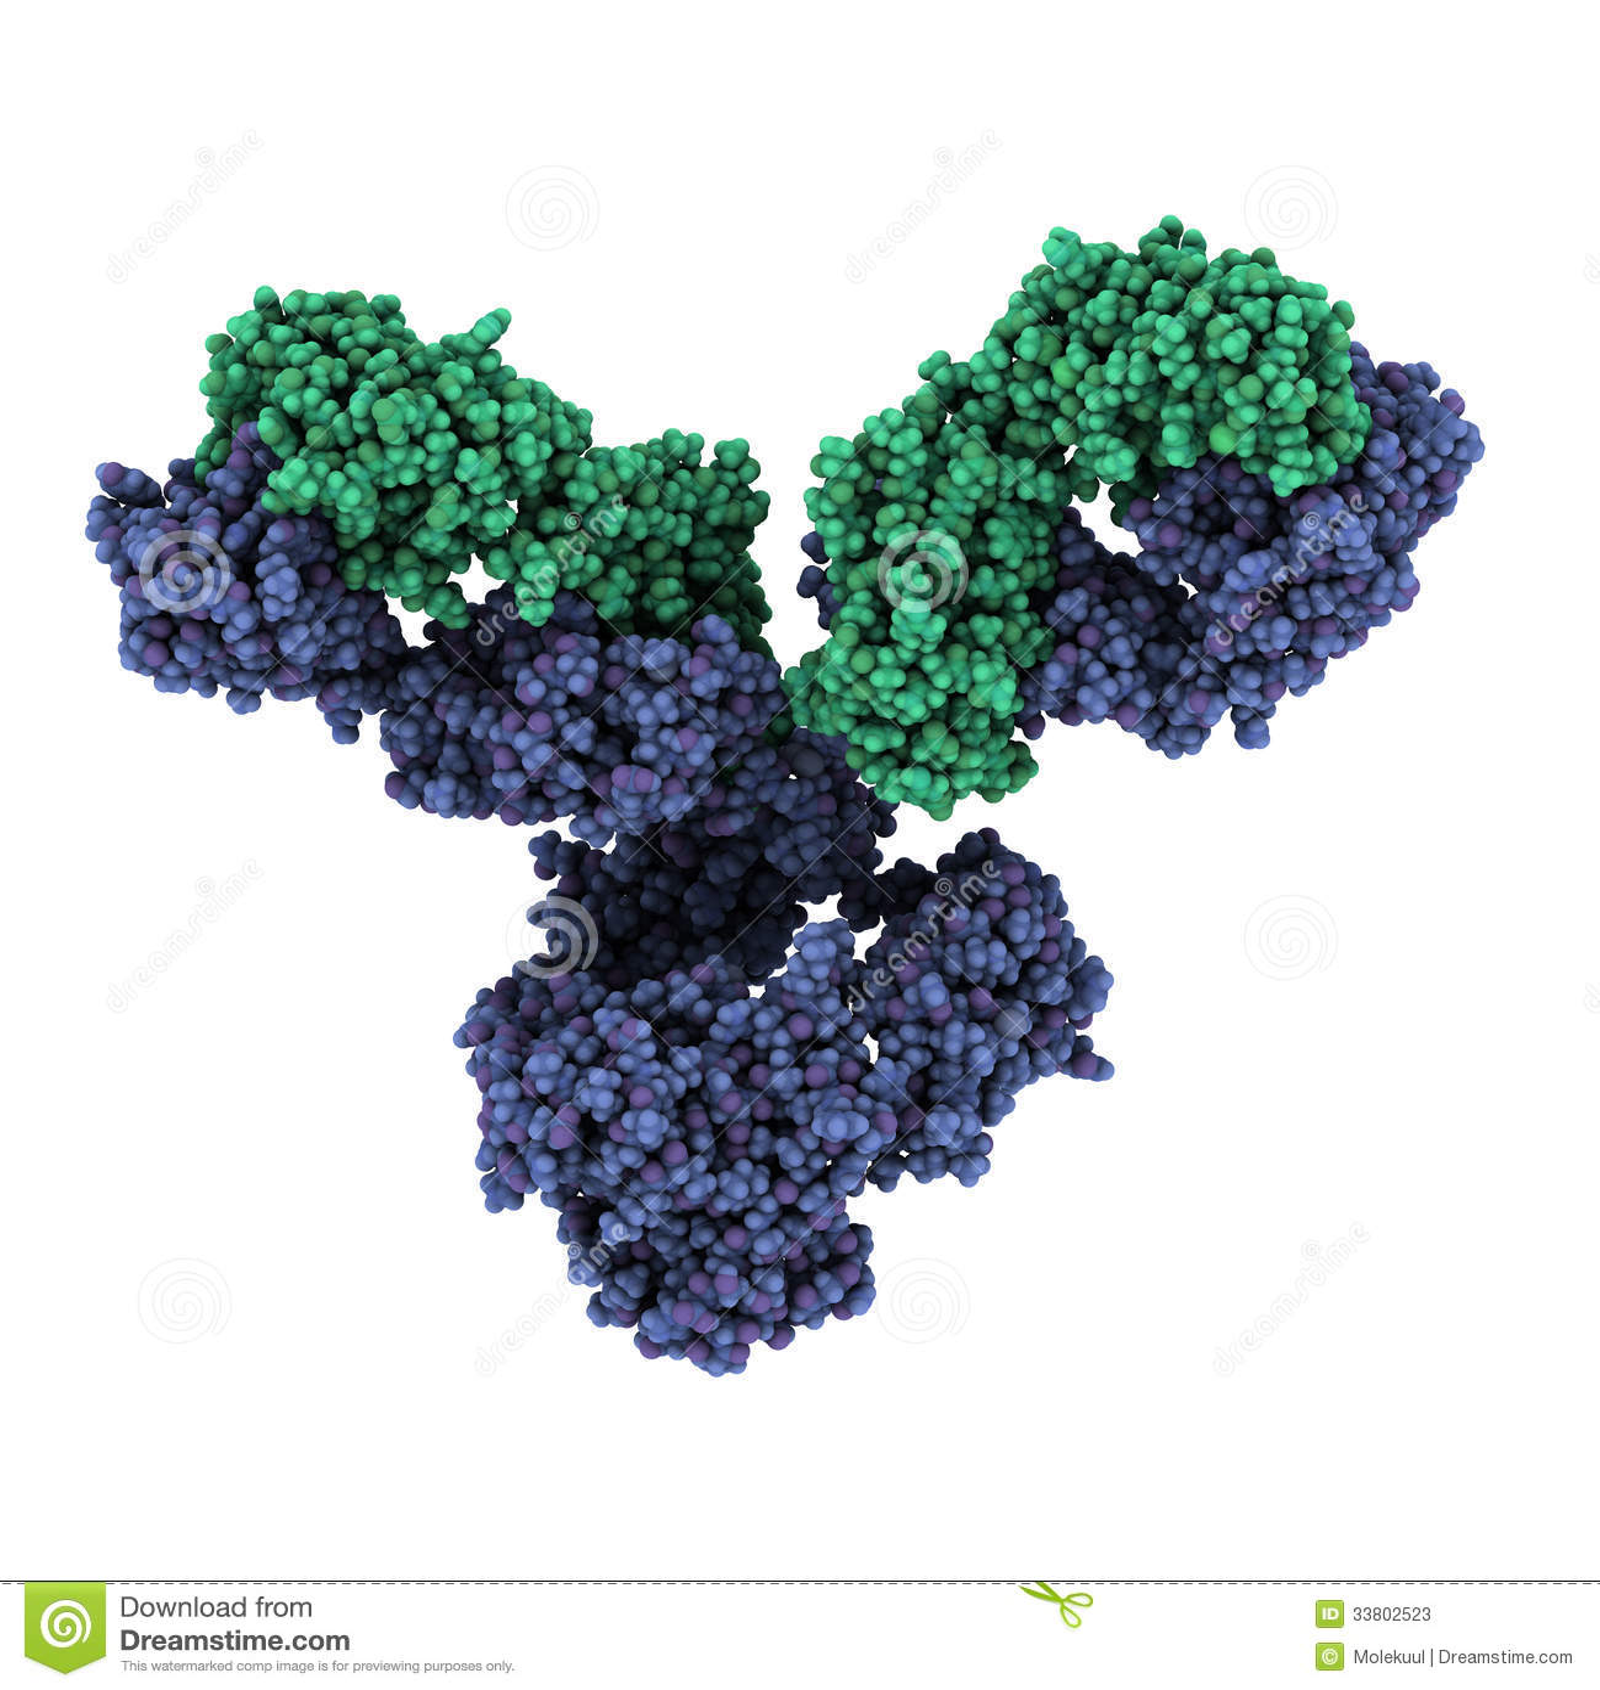 Igg1 Monoclonal Antibody Immunoglobulin Play Essential